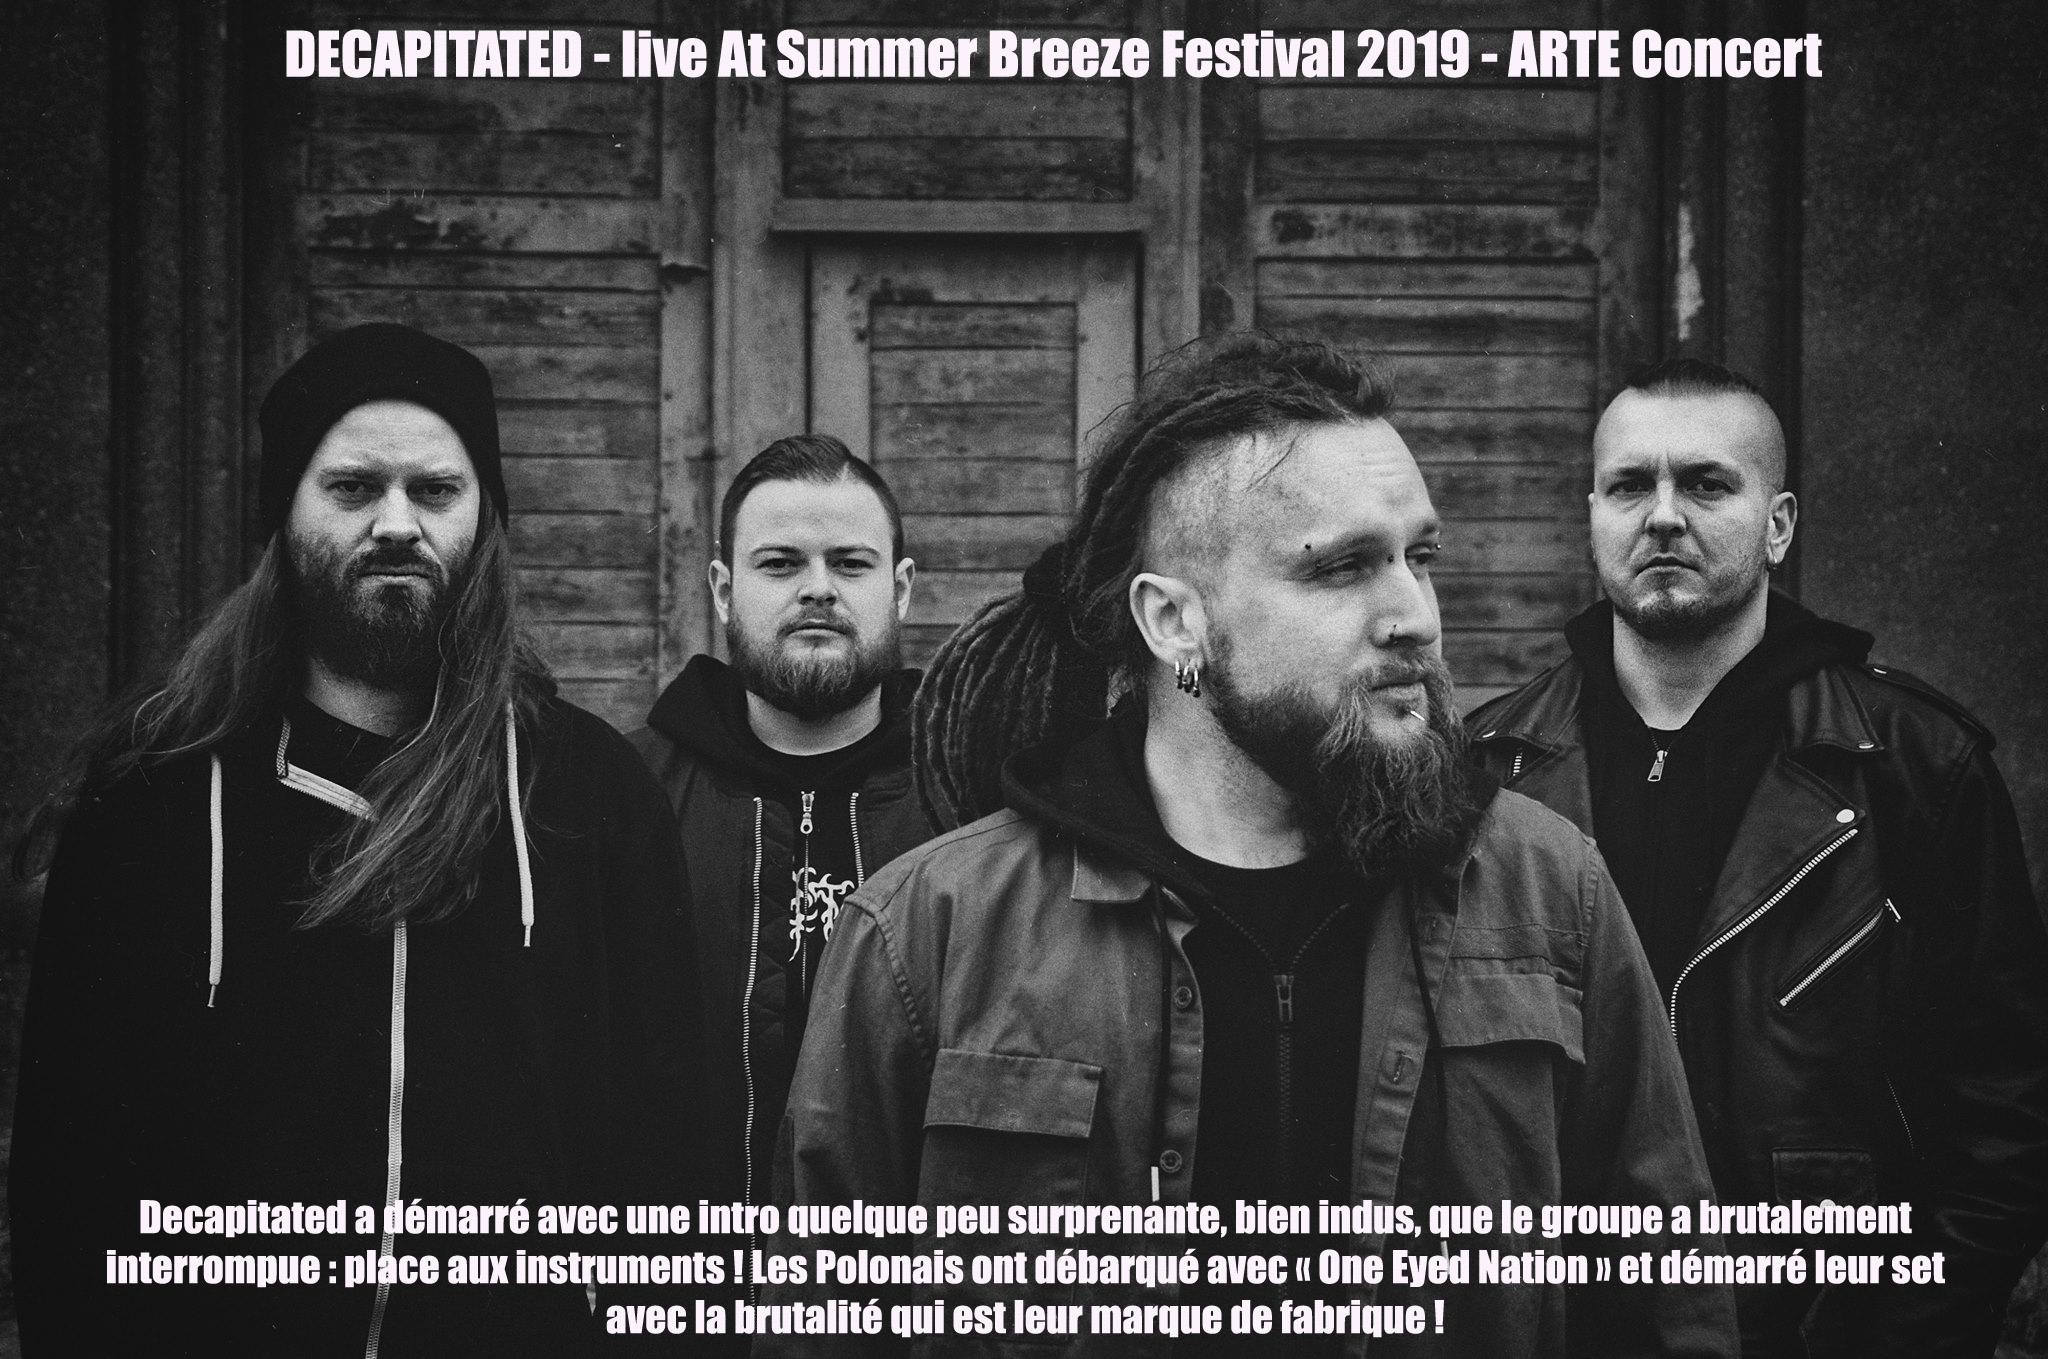 DECAPITATED live At Summer Breeze Festival 2019 - ARTE Concert Decapi11